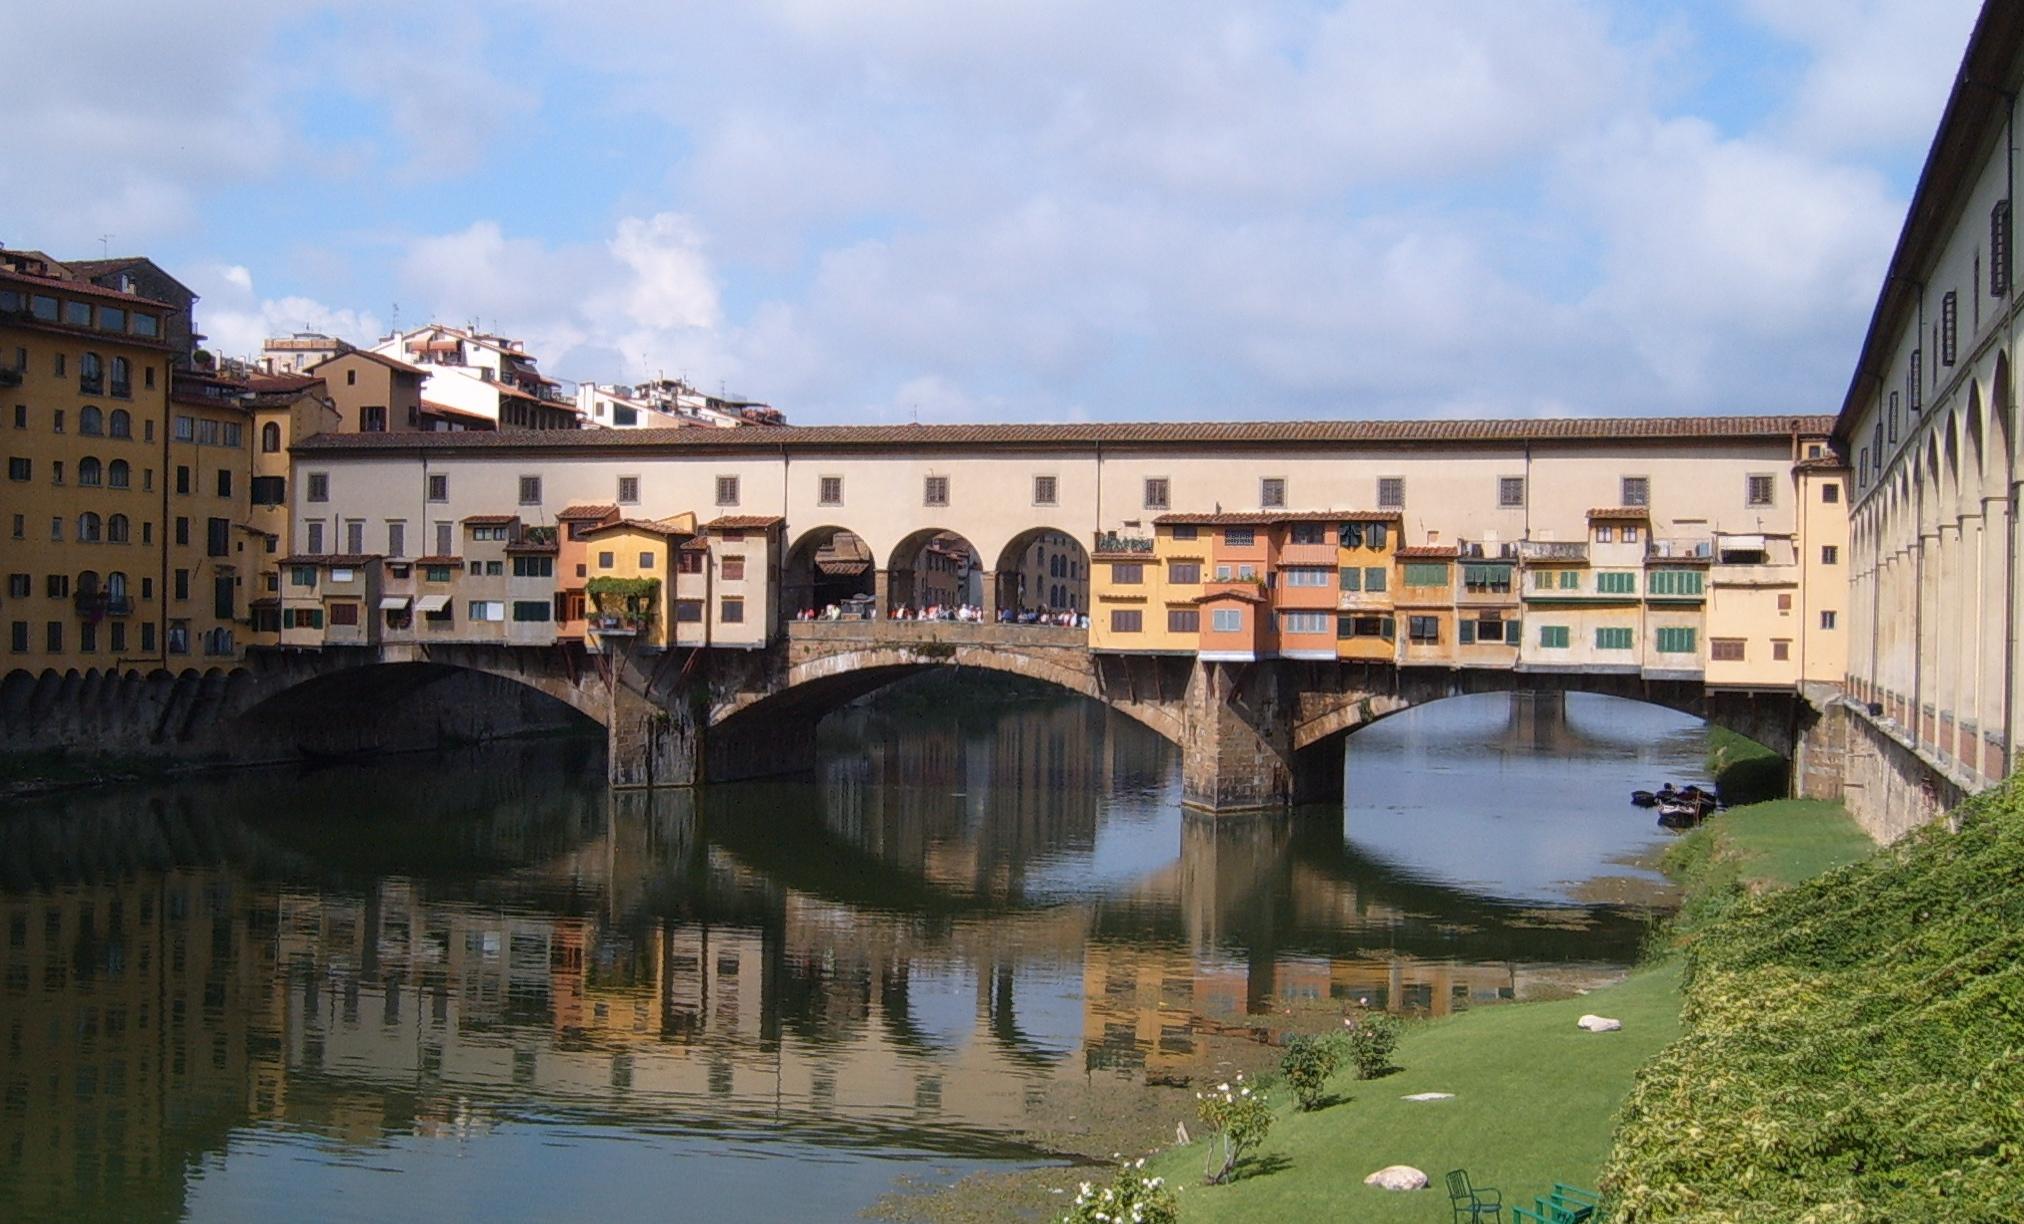 Peter Ponte_Vecchio_Firenze